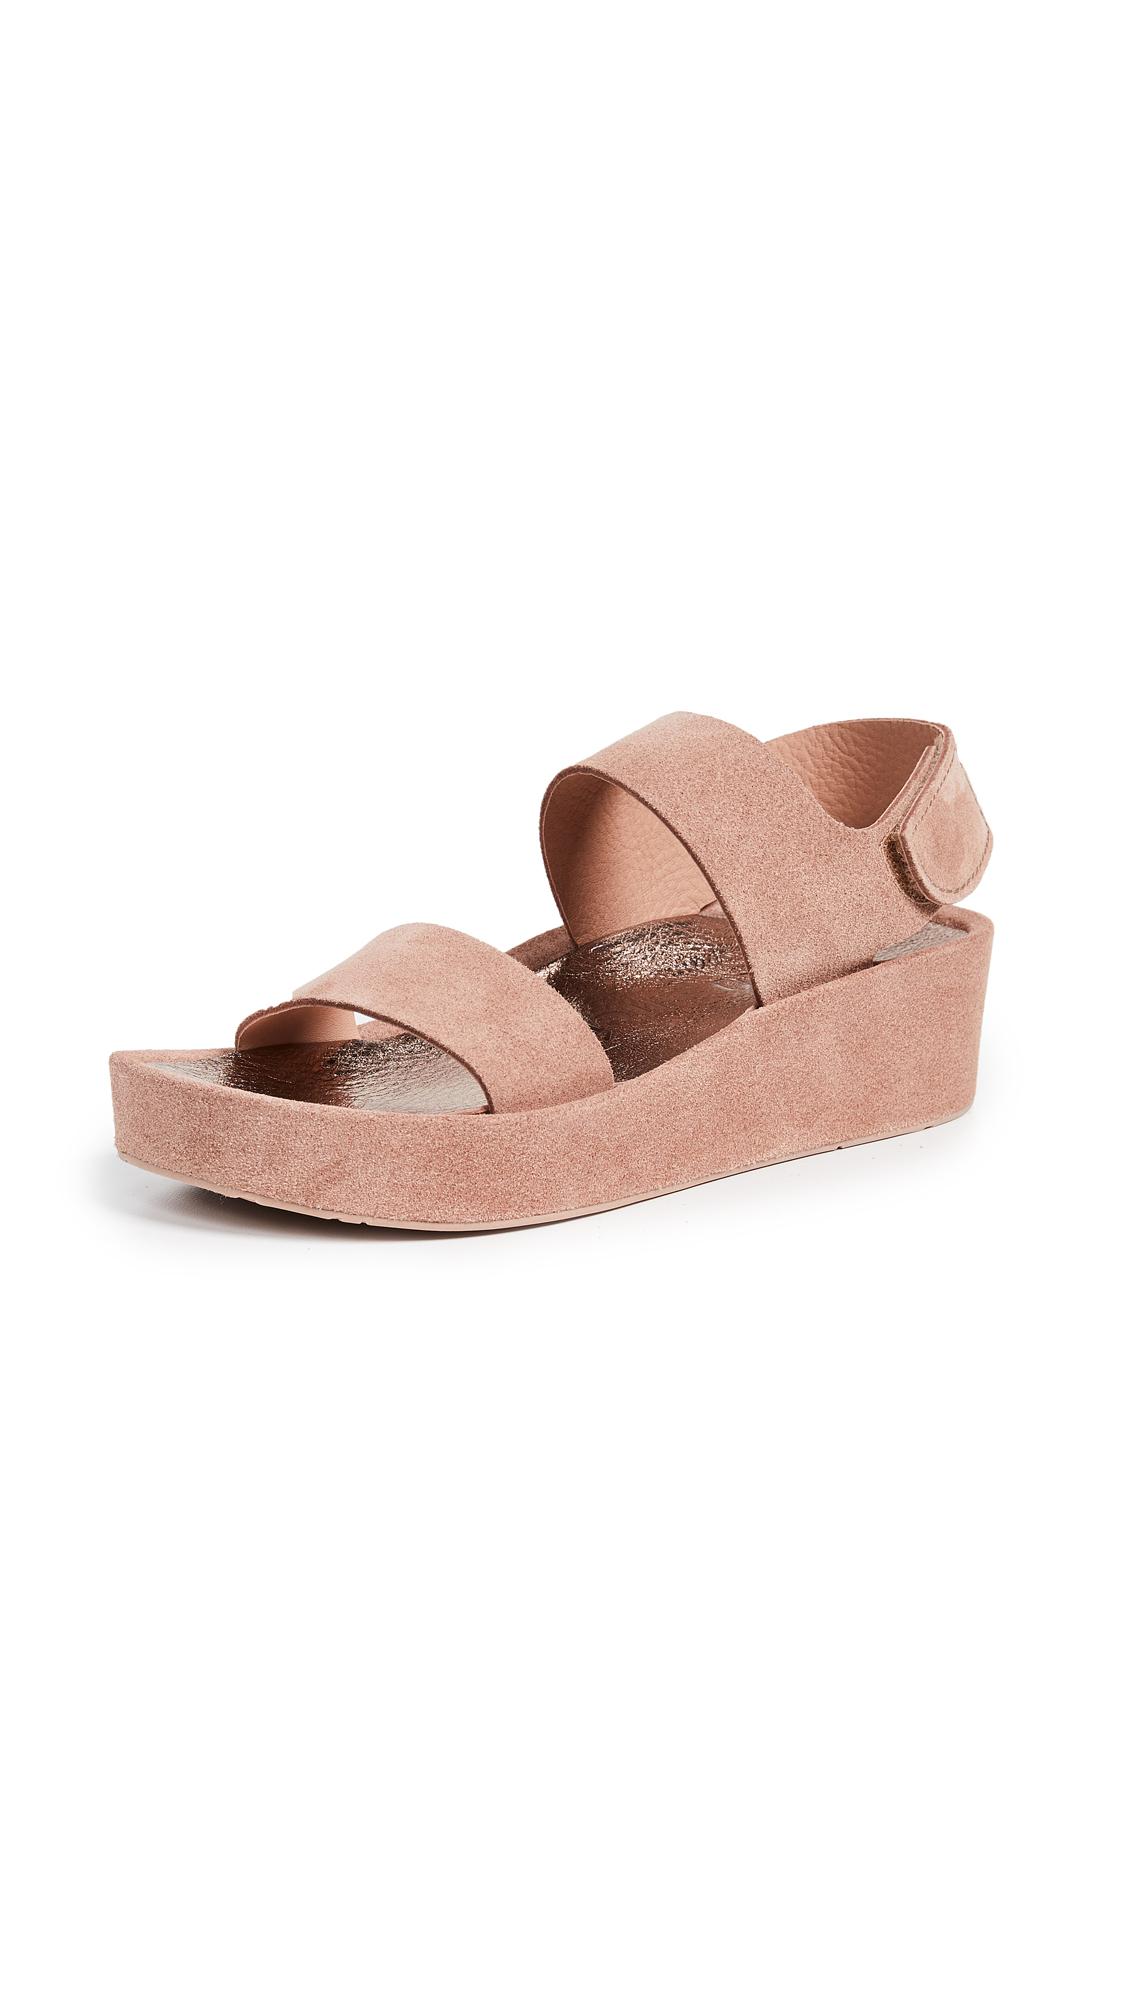 Pedro Garcia Lacey Platform Sandals - Macaron